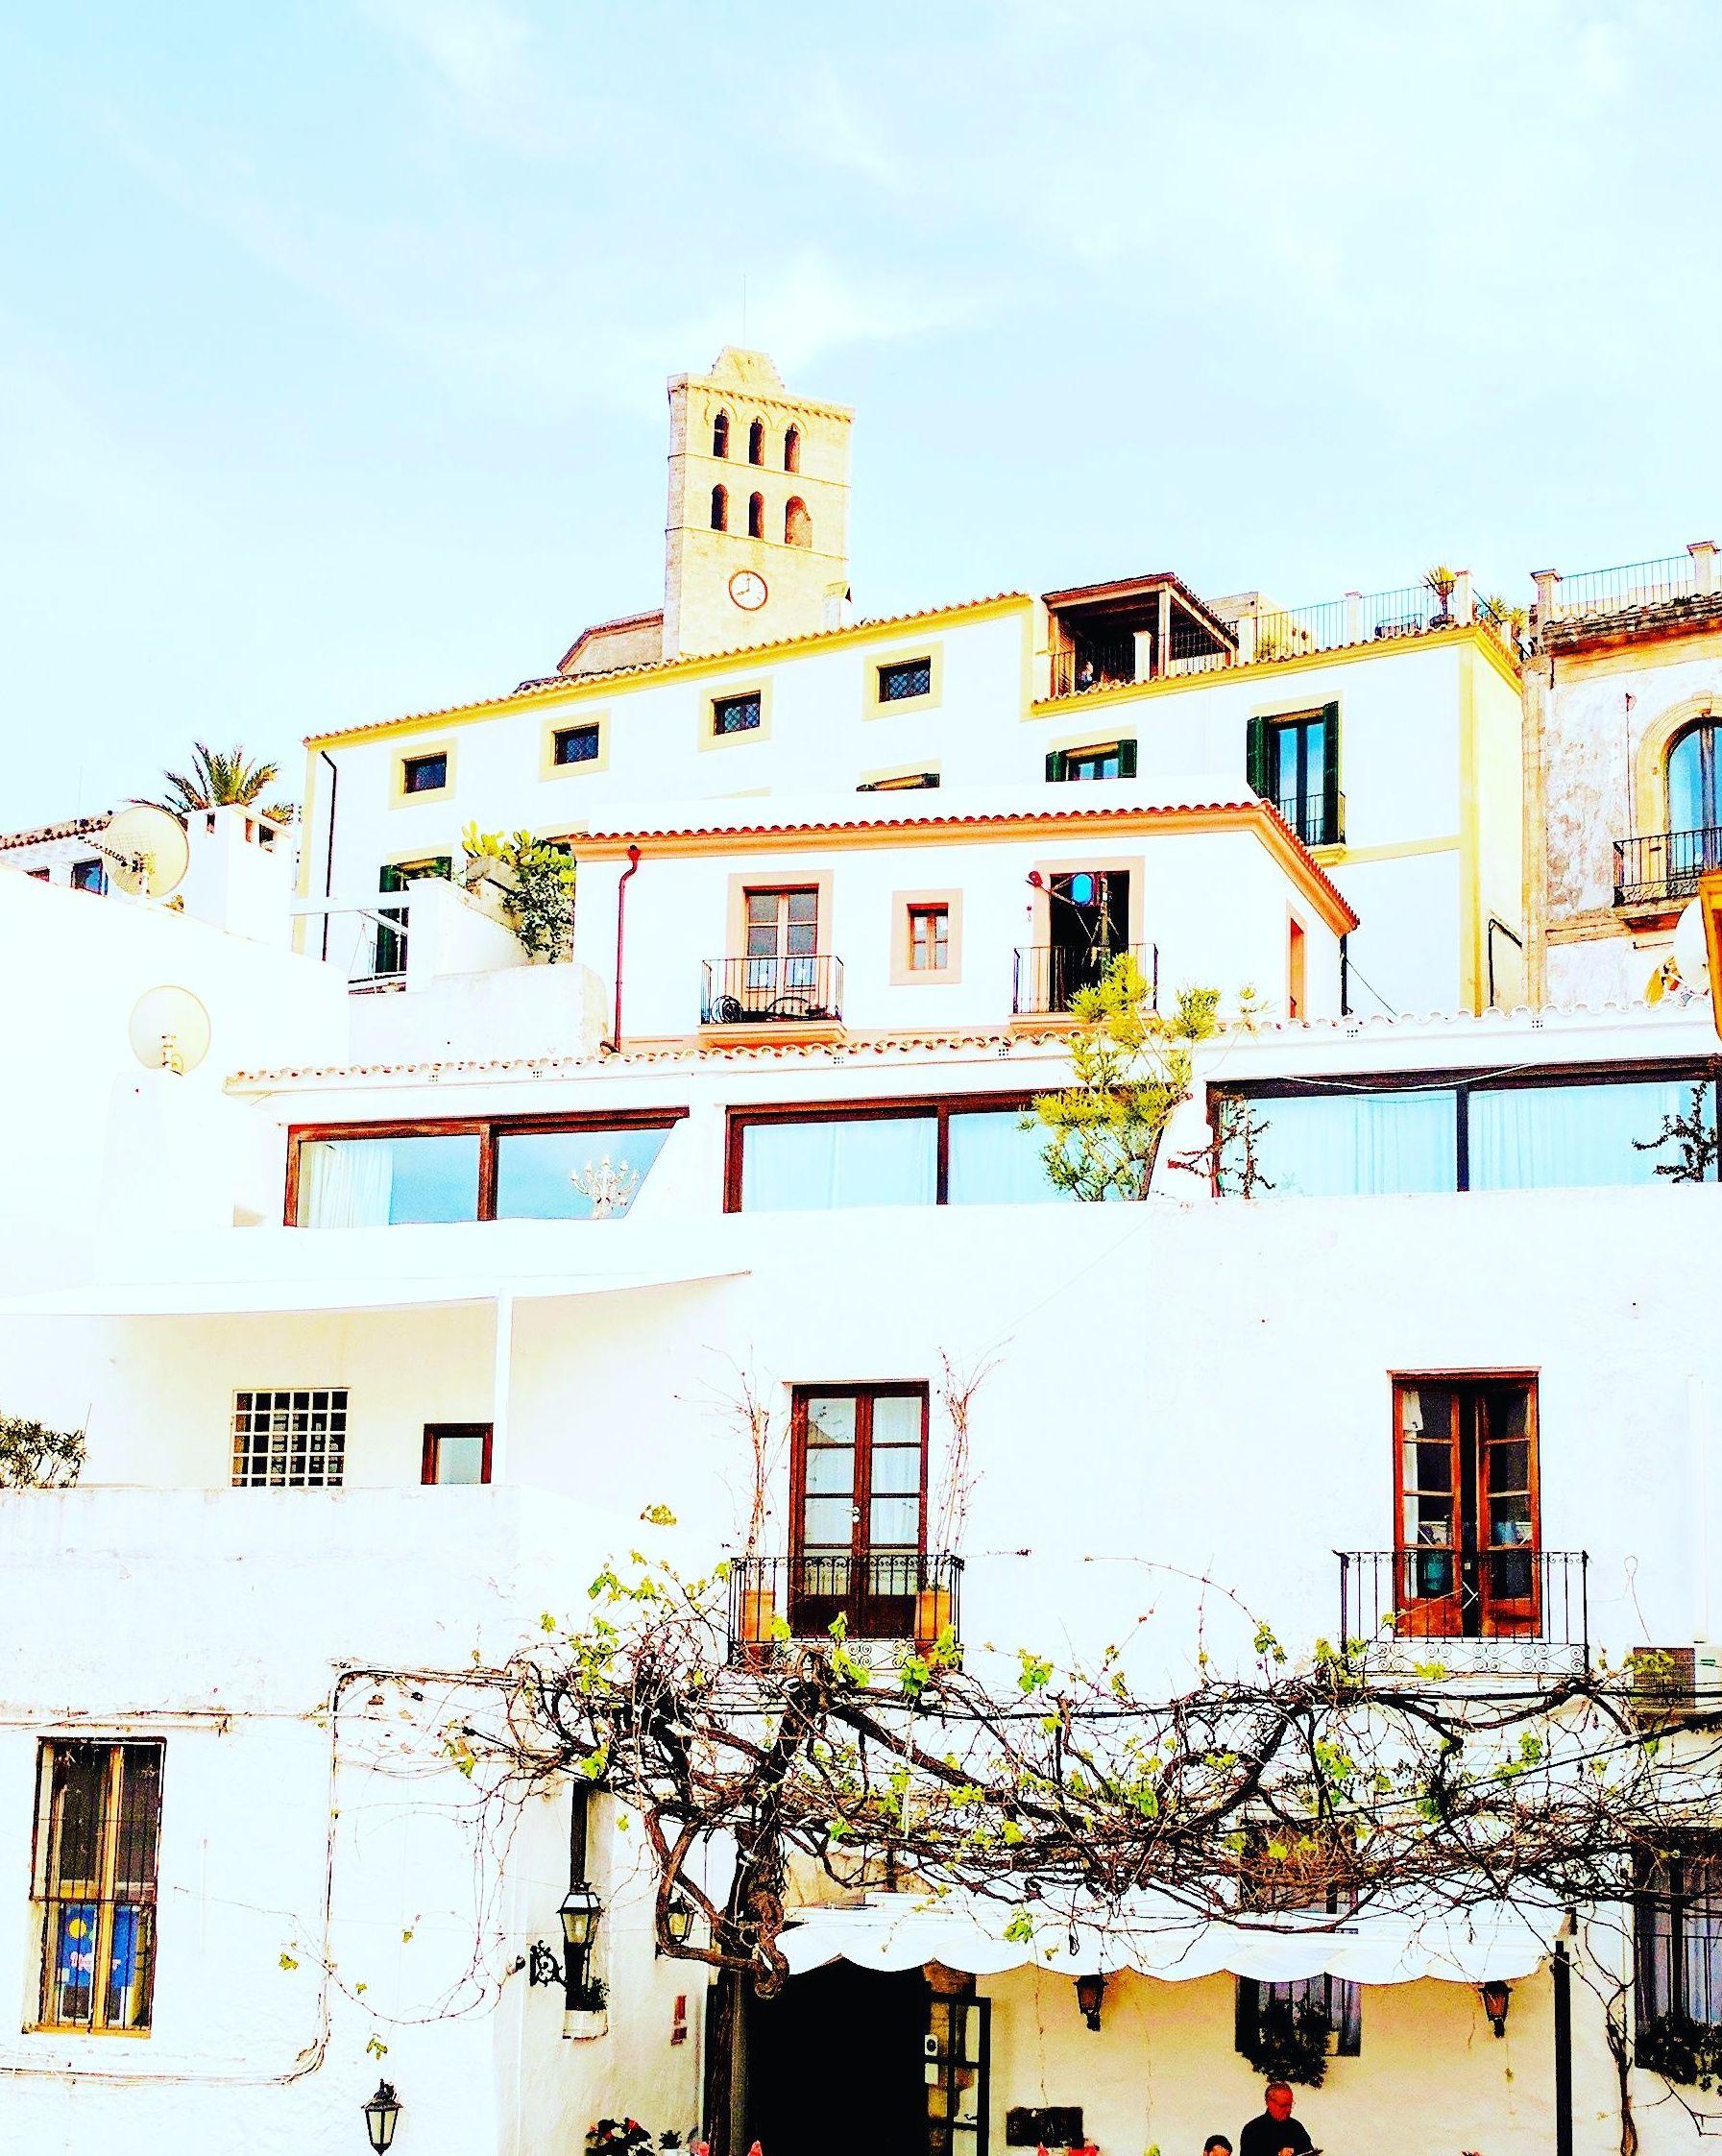 Foto 20 de Abogados en Eivissa | Raad Abogados. Tel 691 270 993